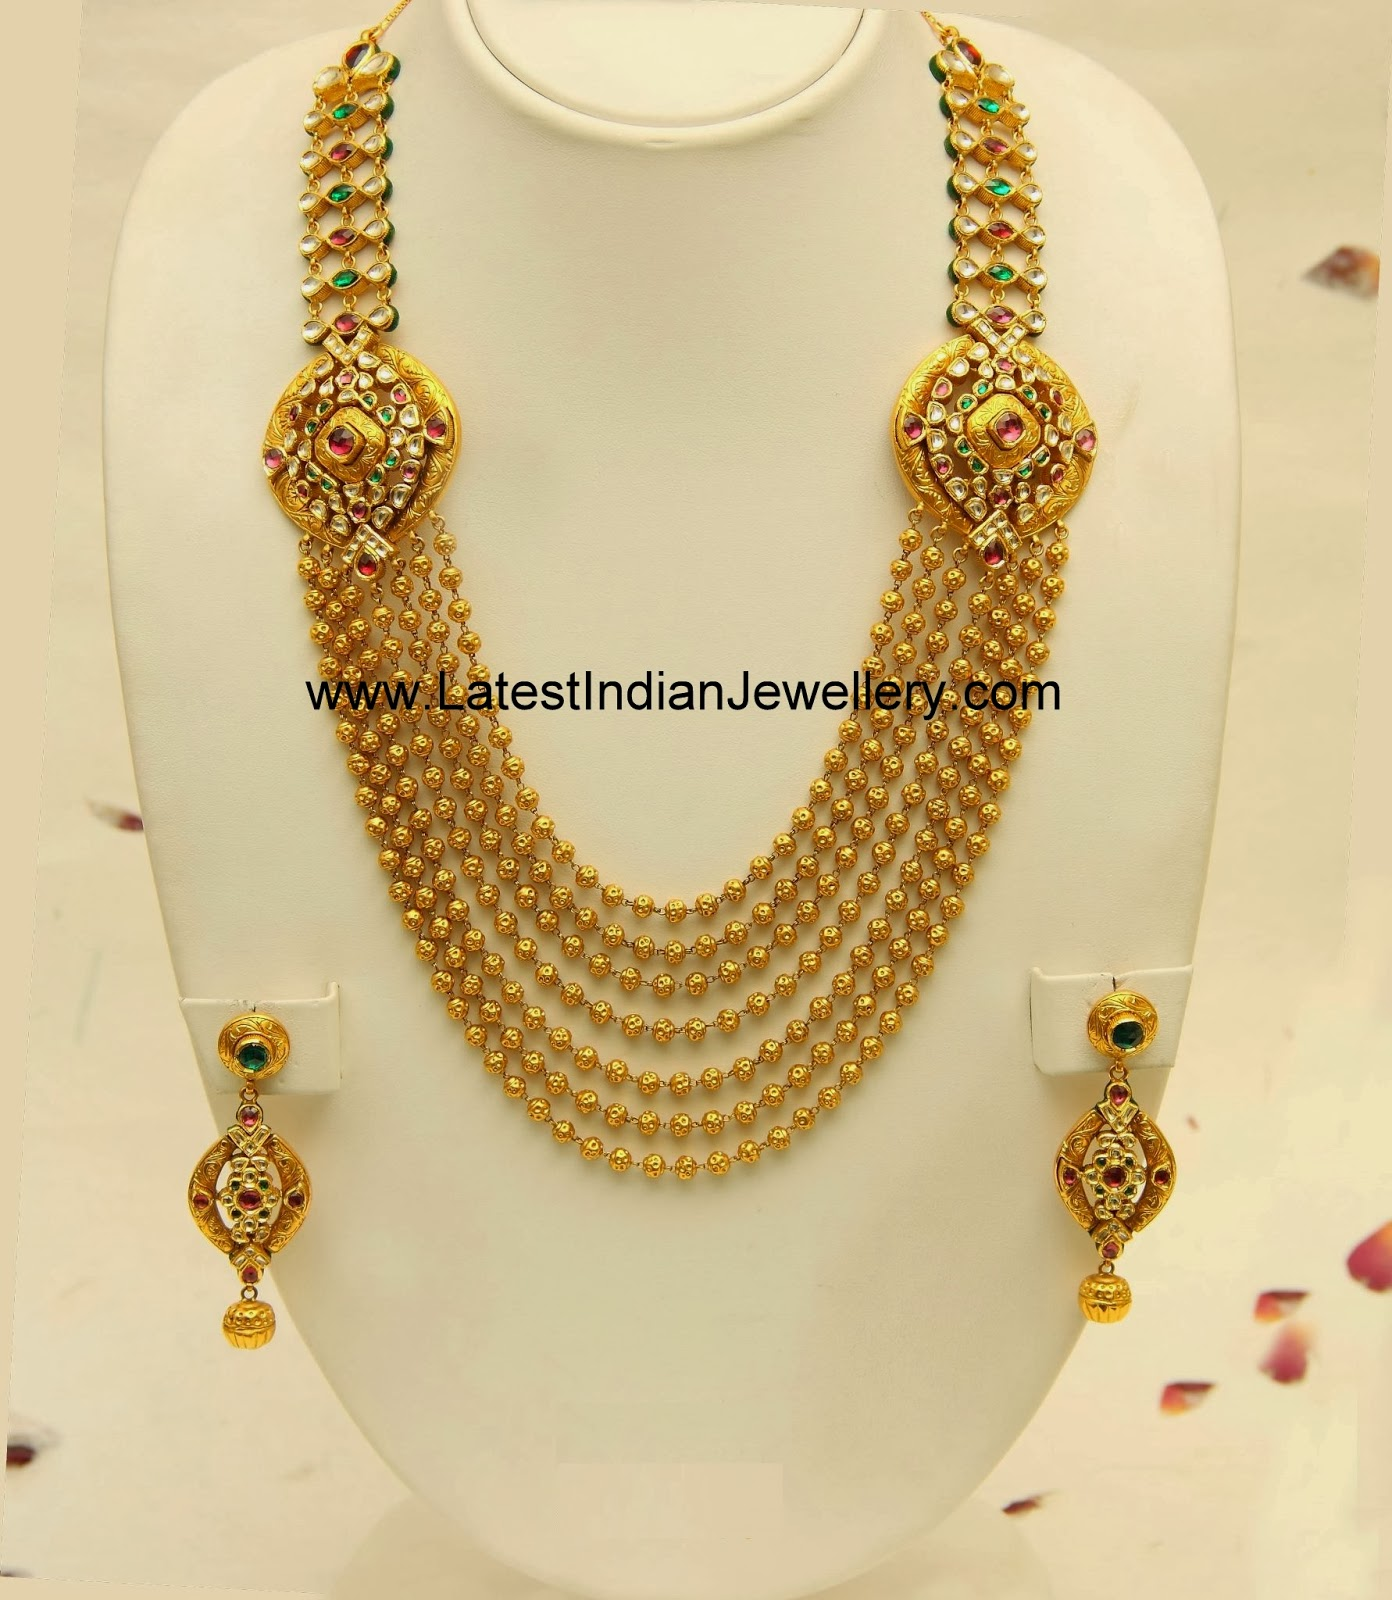 Modern Indian Wedding Jewellery: Gold Wedding Rings: Modern Indian Gold Jewellery Designs